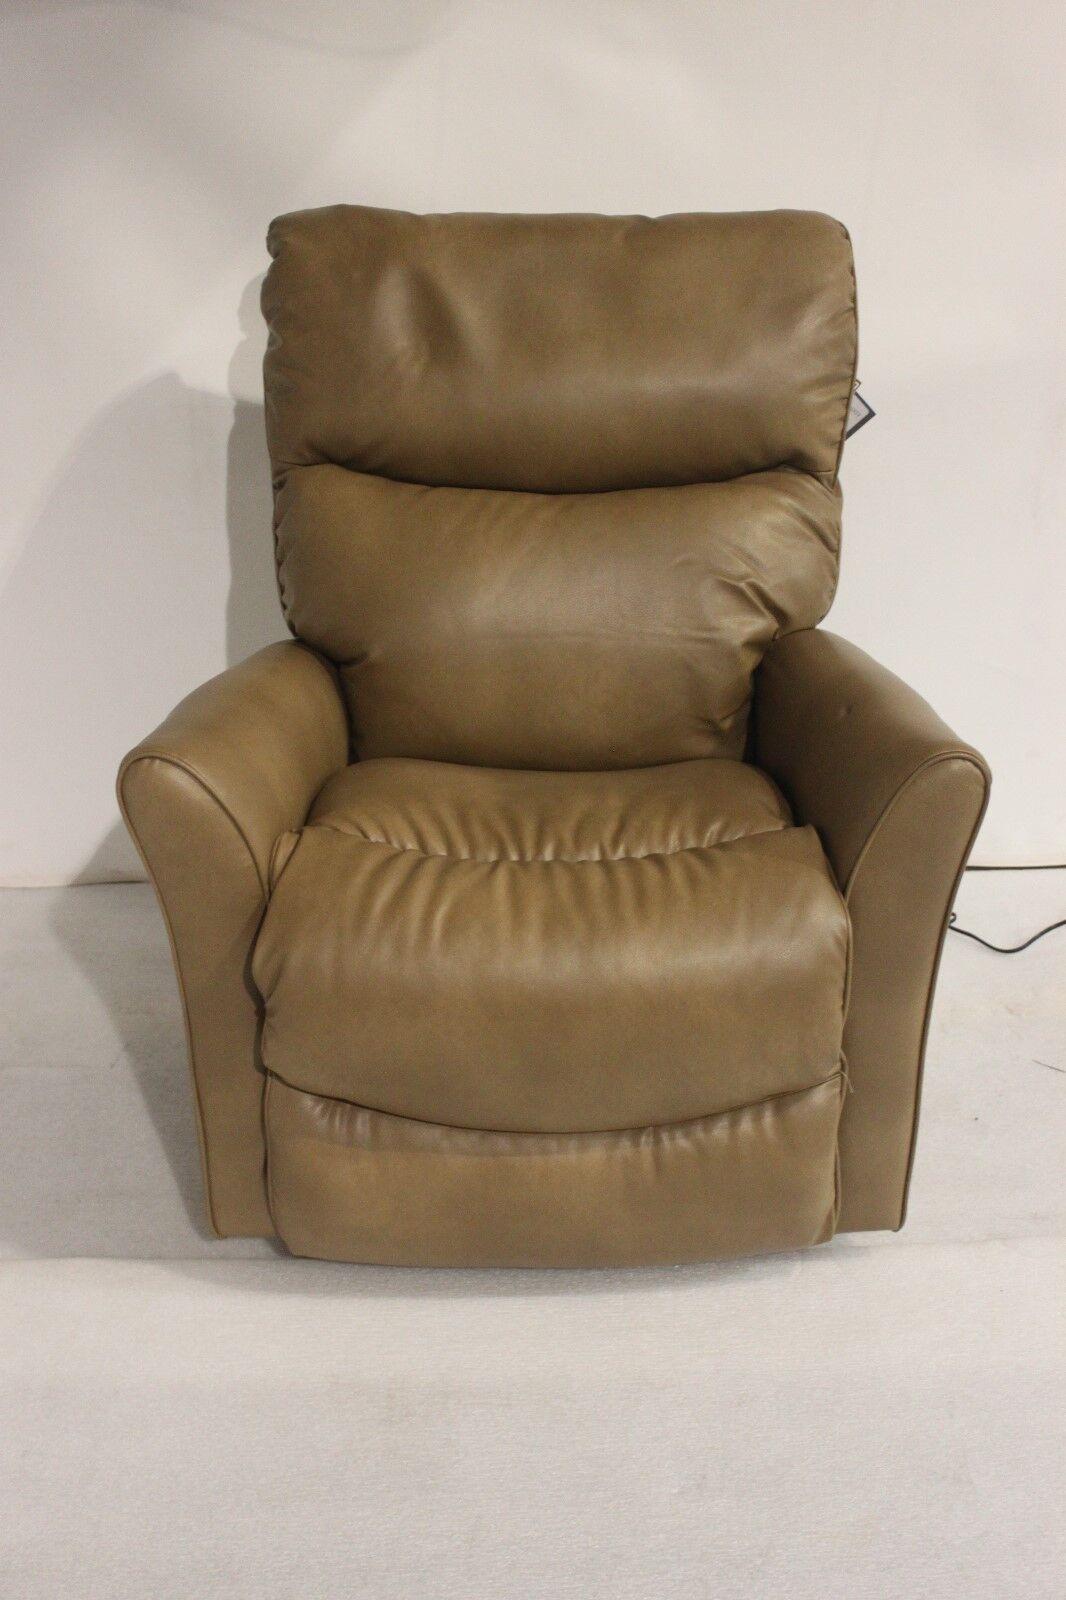 Swell 35 La Z Boy Rv Camper Power Rocker Recliner Chair Wharton Palomino Lazy Boy Machost Co Dining Chair Design Ideas Machostcouk